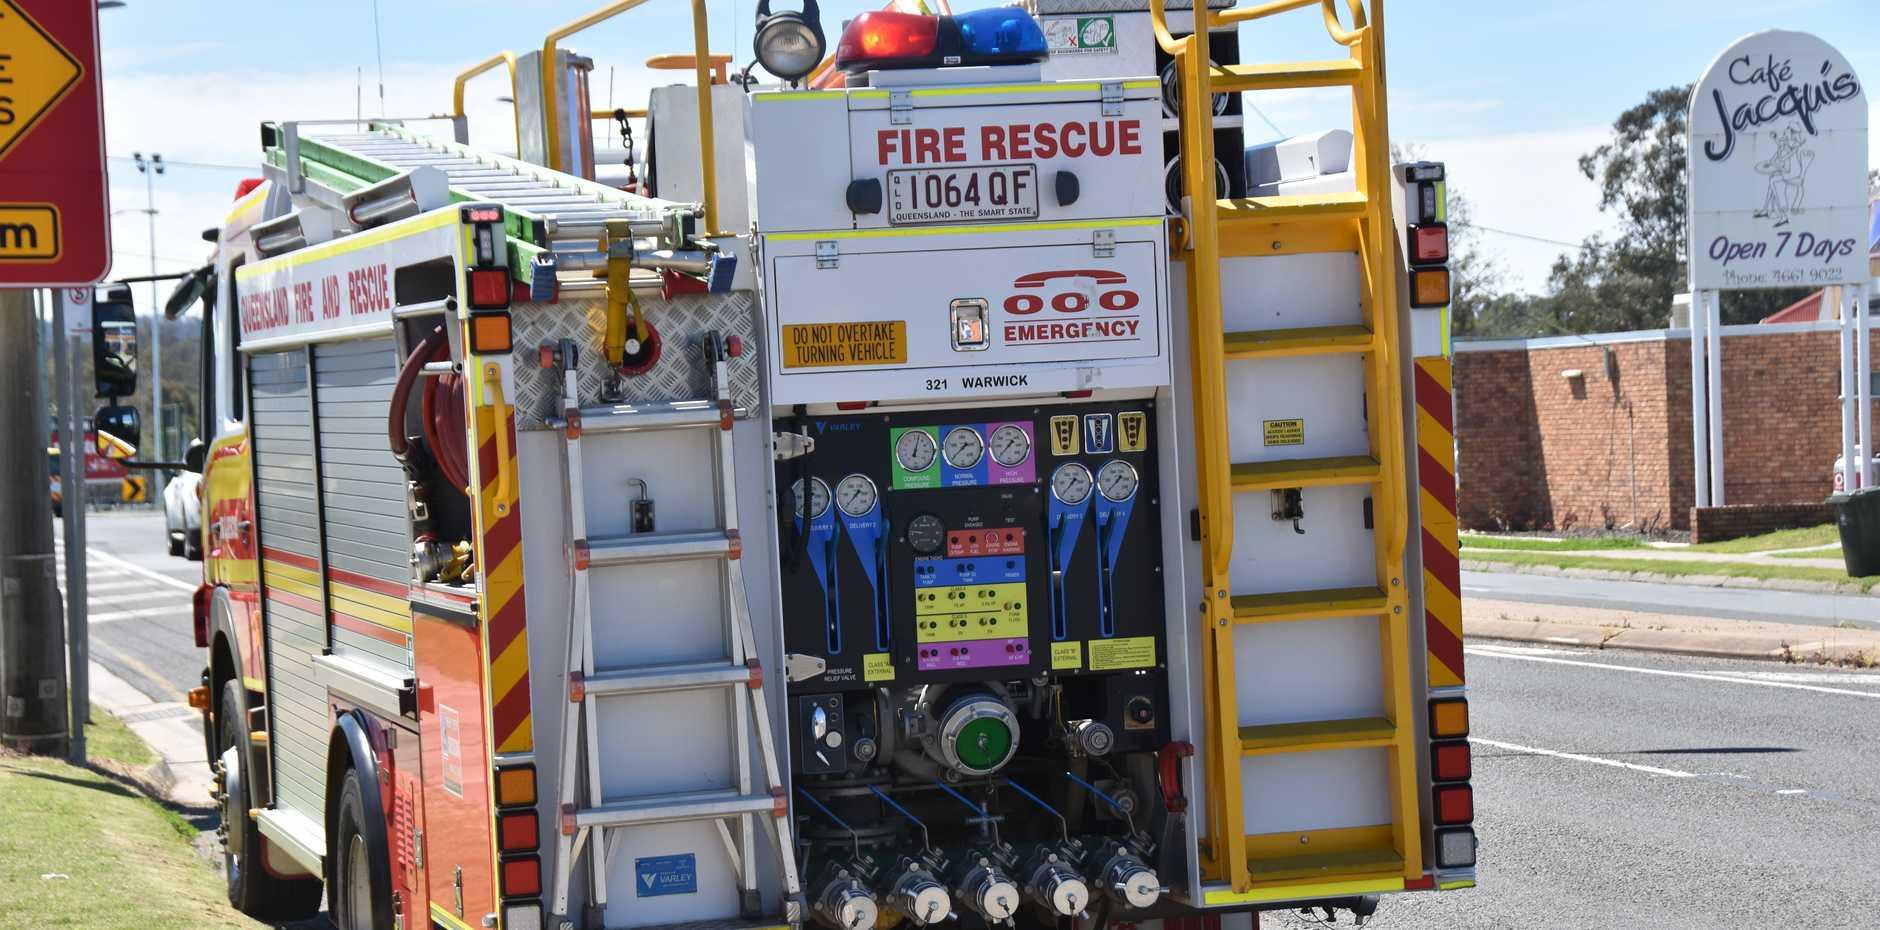 Crews called to separate alarm calls in Warwick